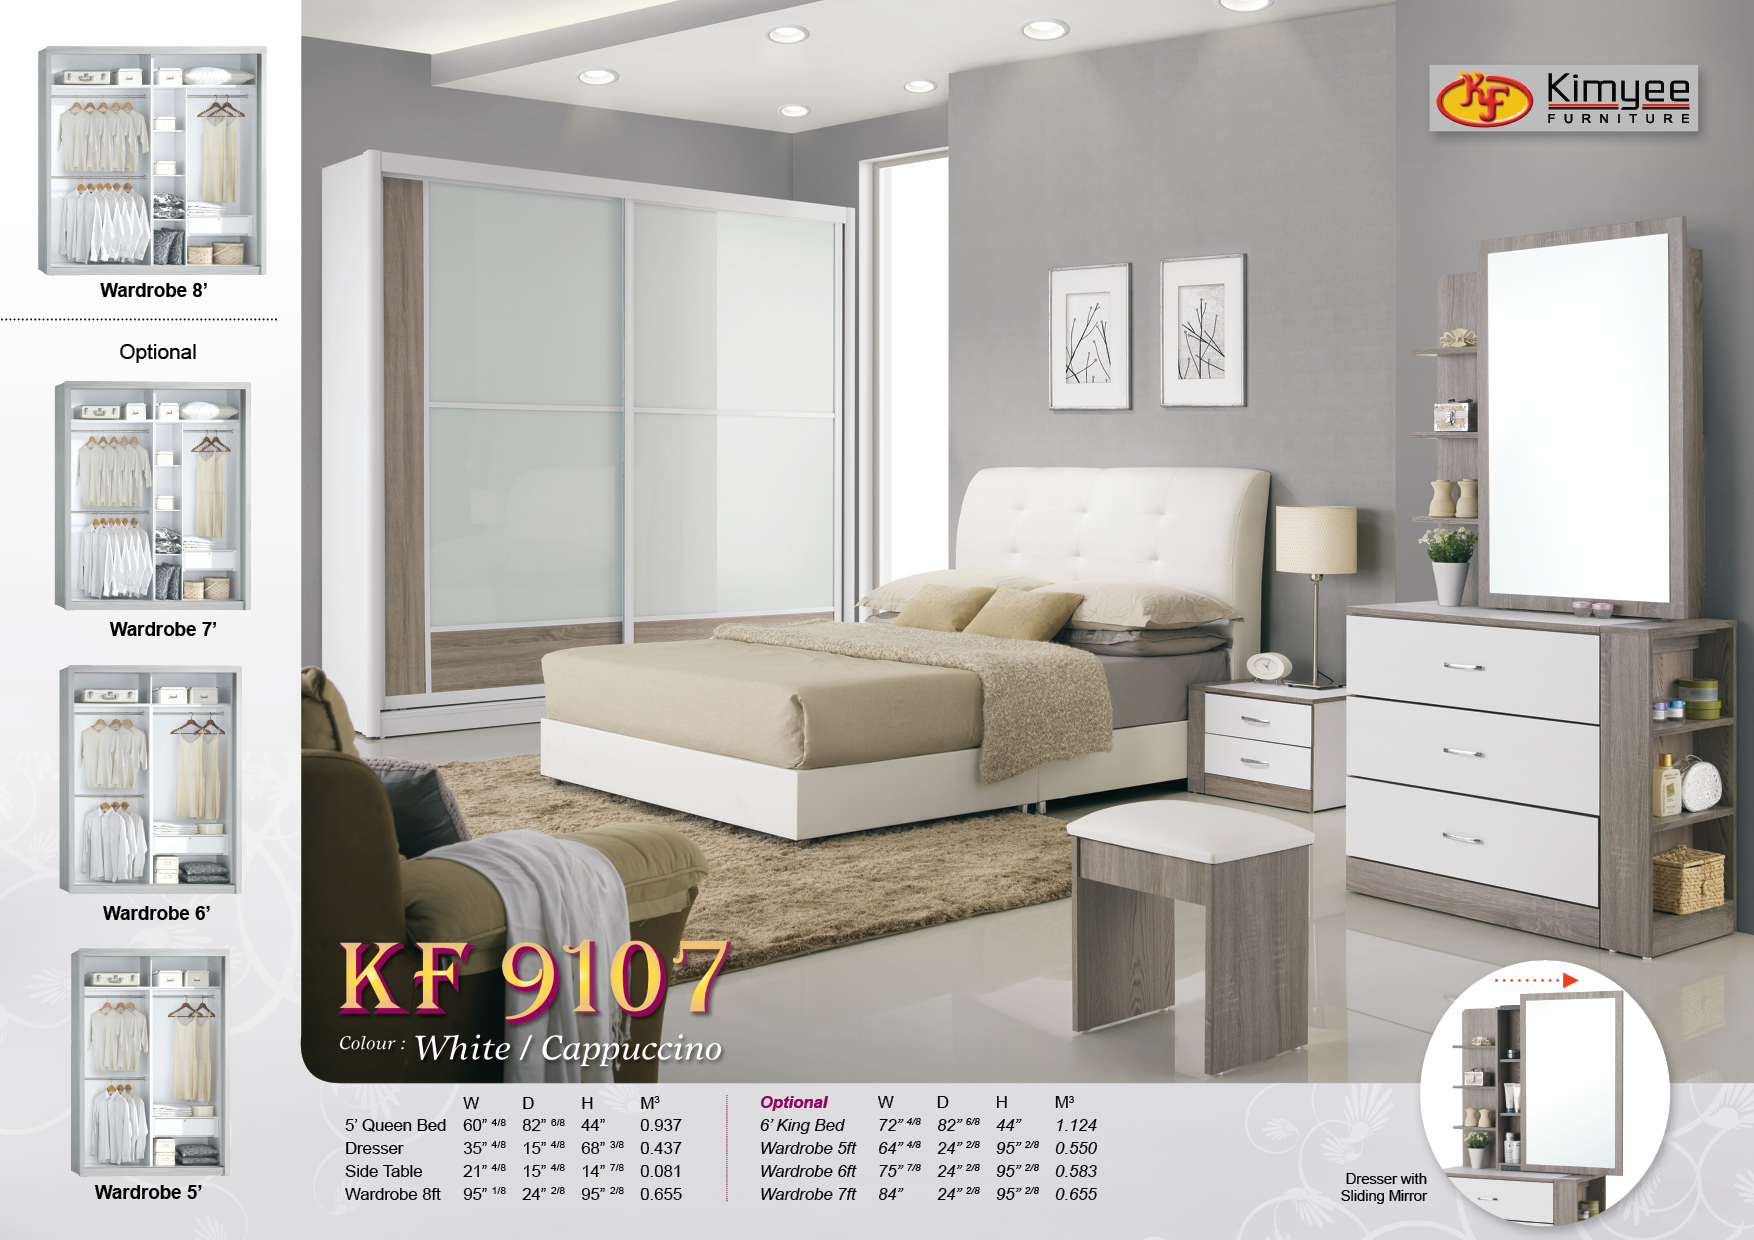 KF9107